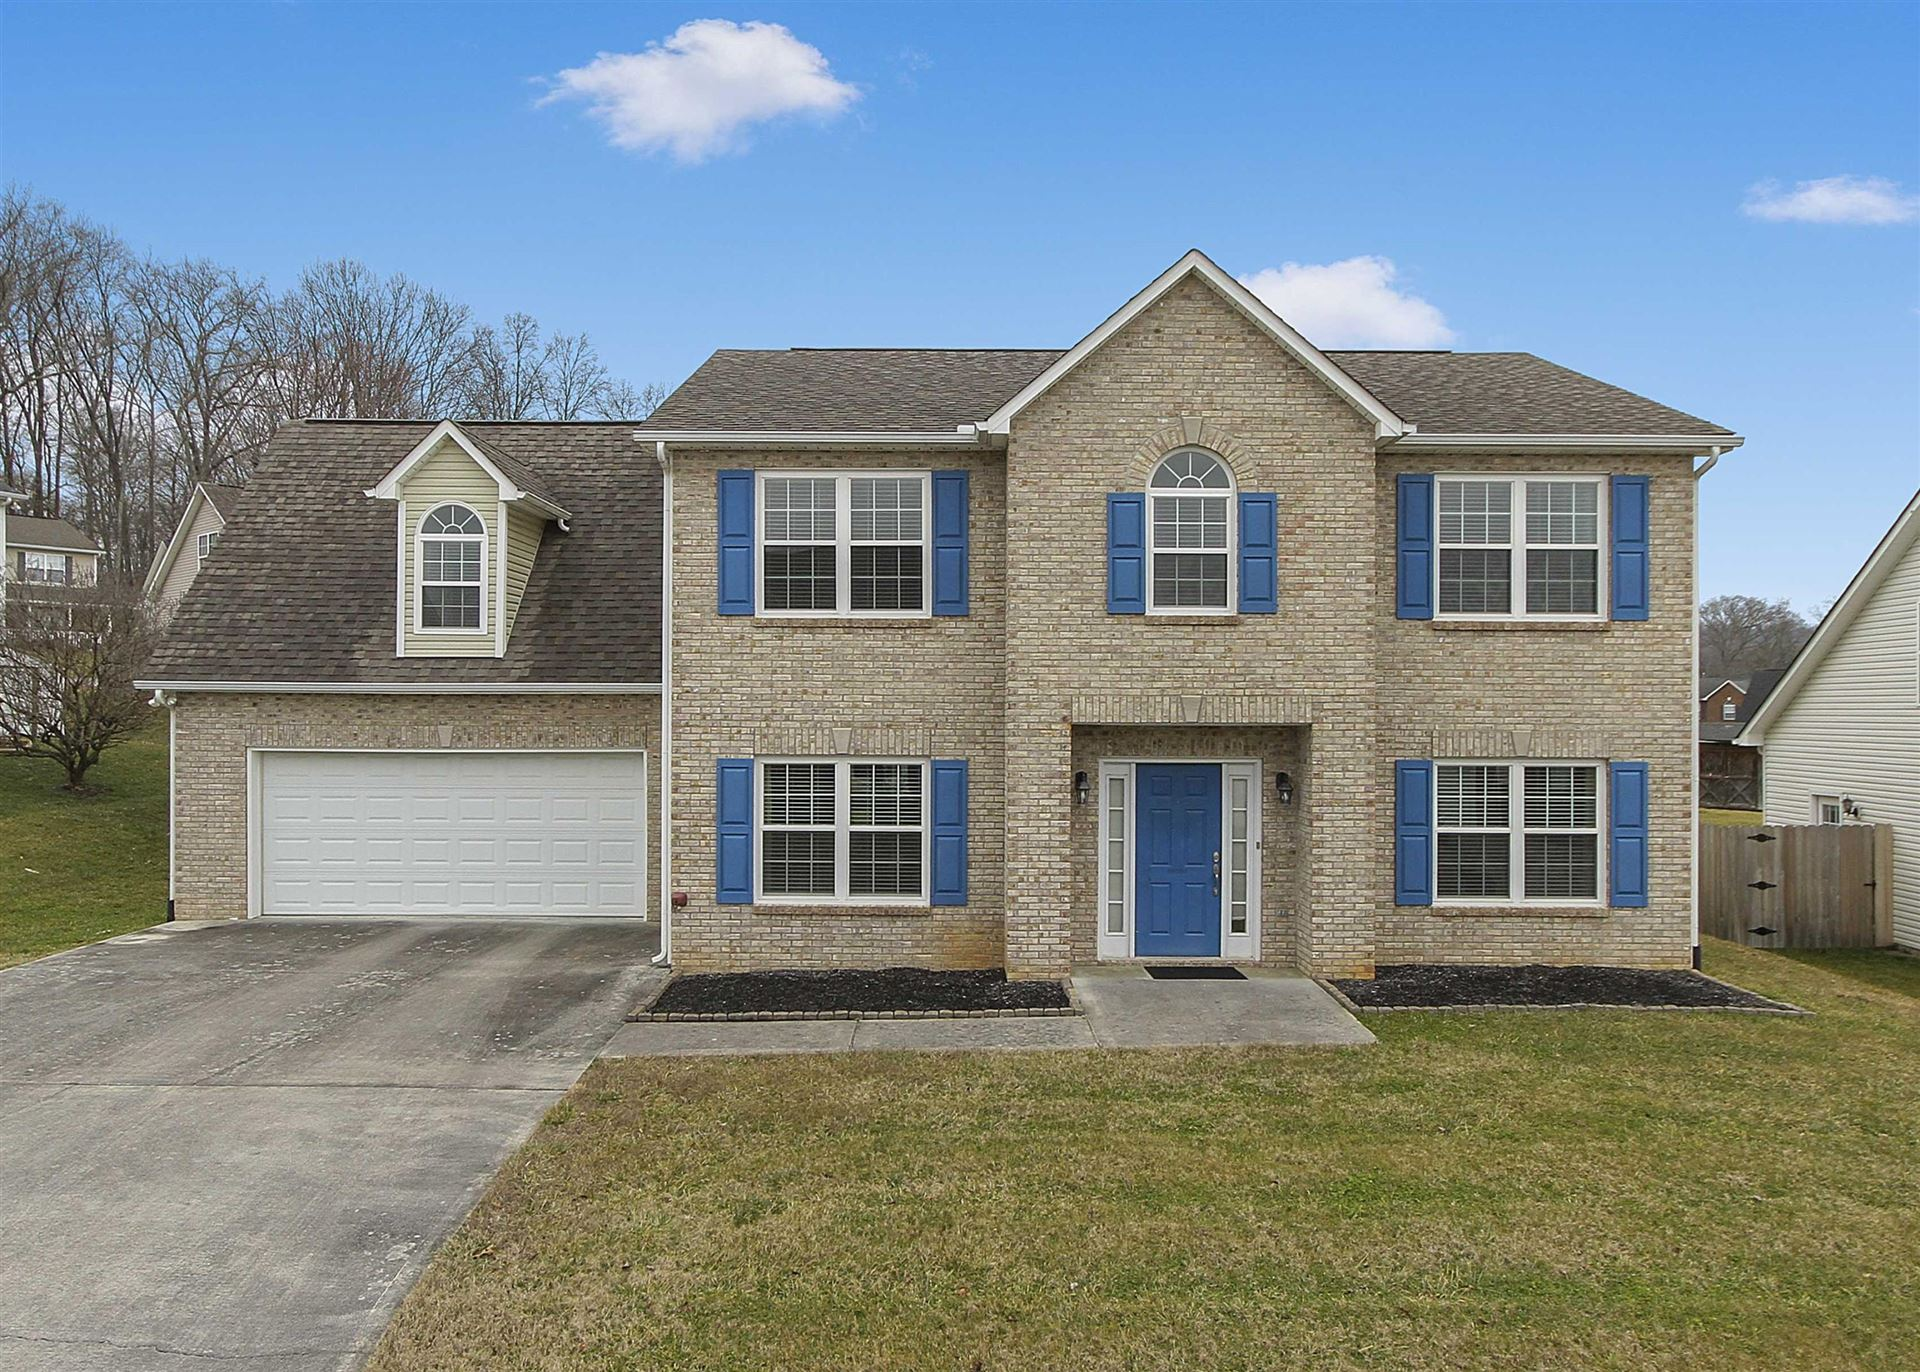 Photo of 1431 Caribou Lane, Knoxville, TN 37931 (MLS # 1148905)